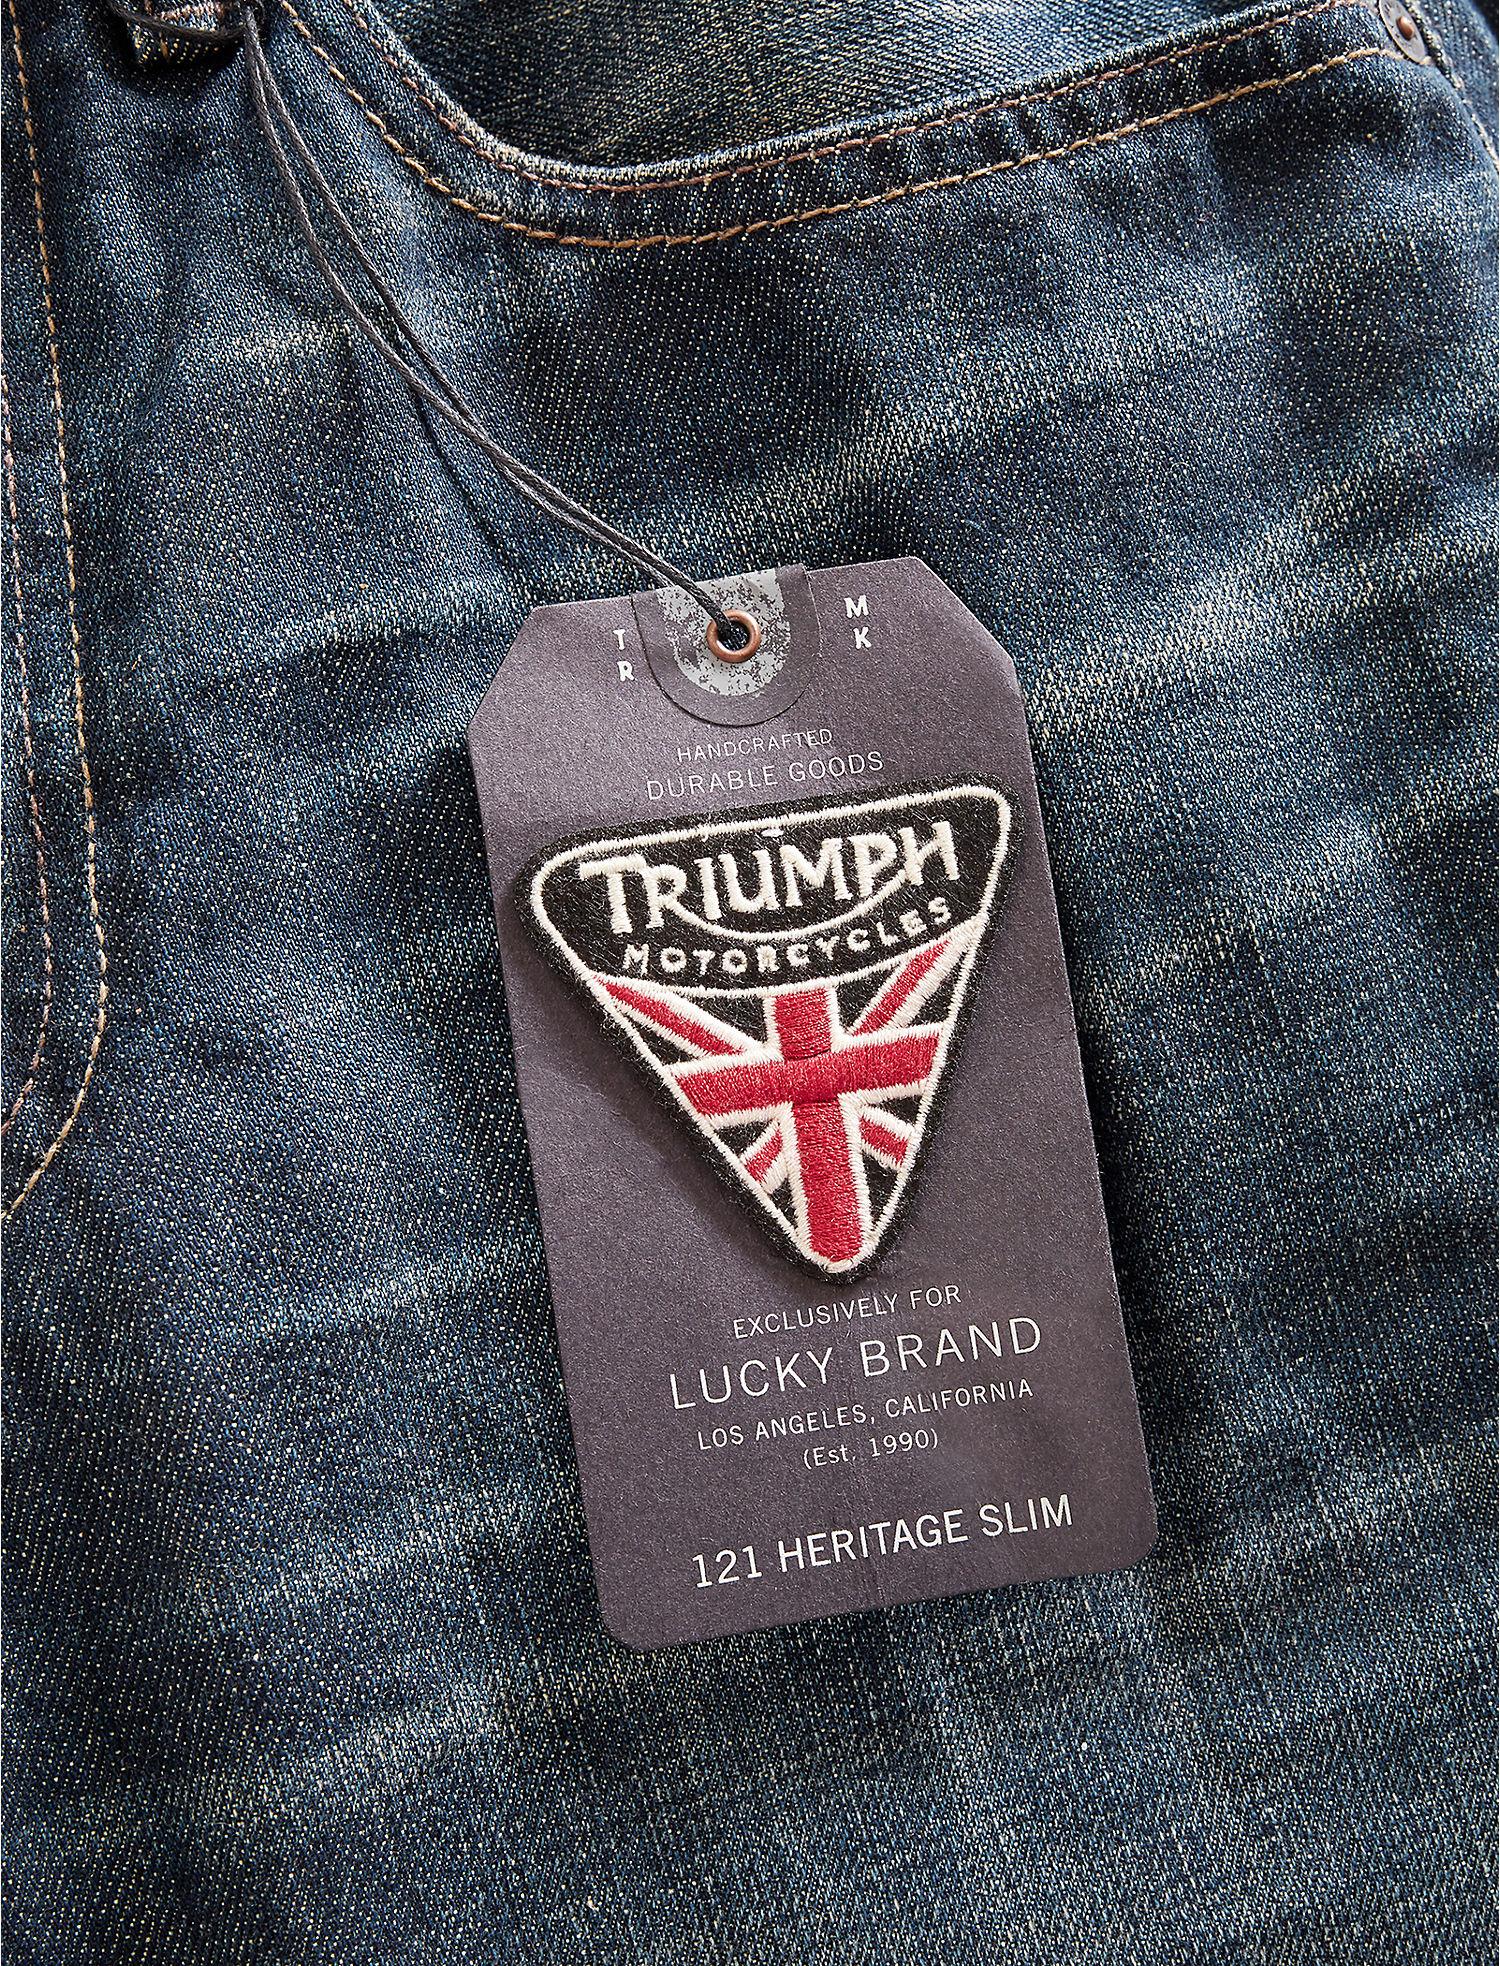 121 heritage slim triumph | lucky brand